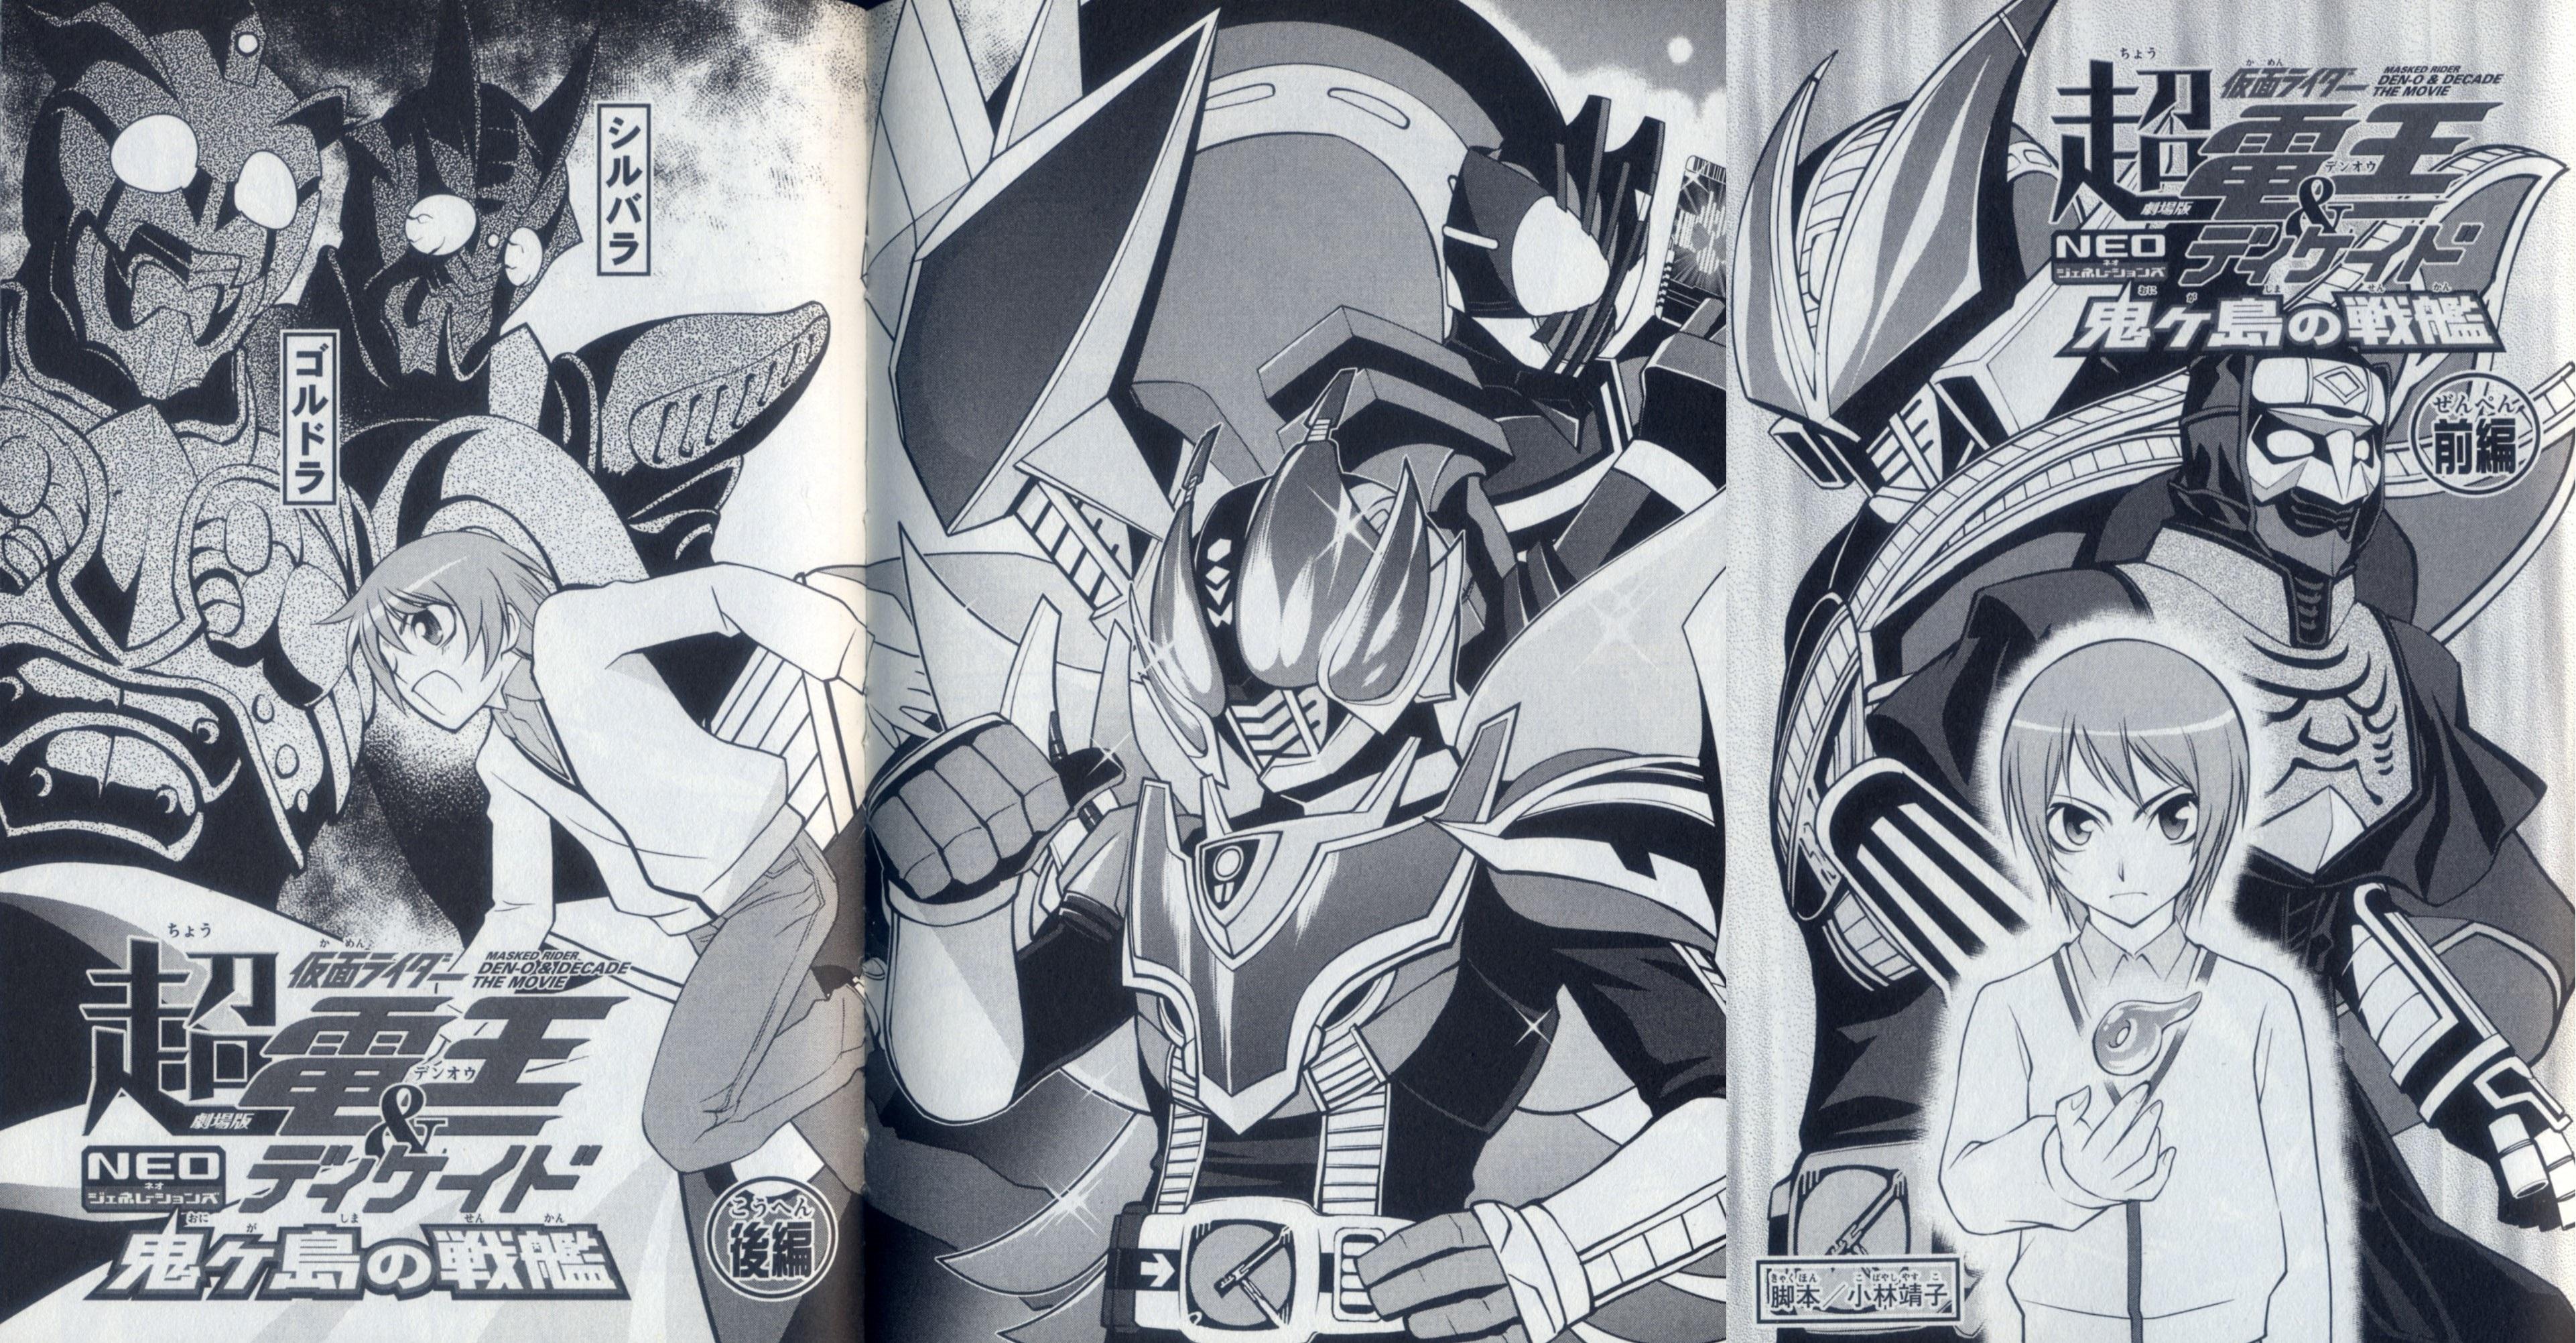 Cho Kamen Rider Den-O & Decade Neo Generations: The Onigashima Warship (manga)